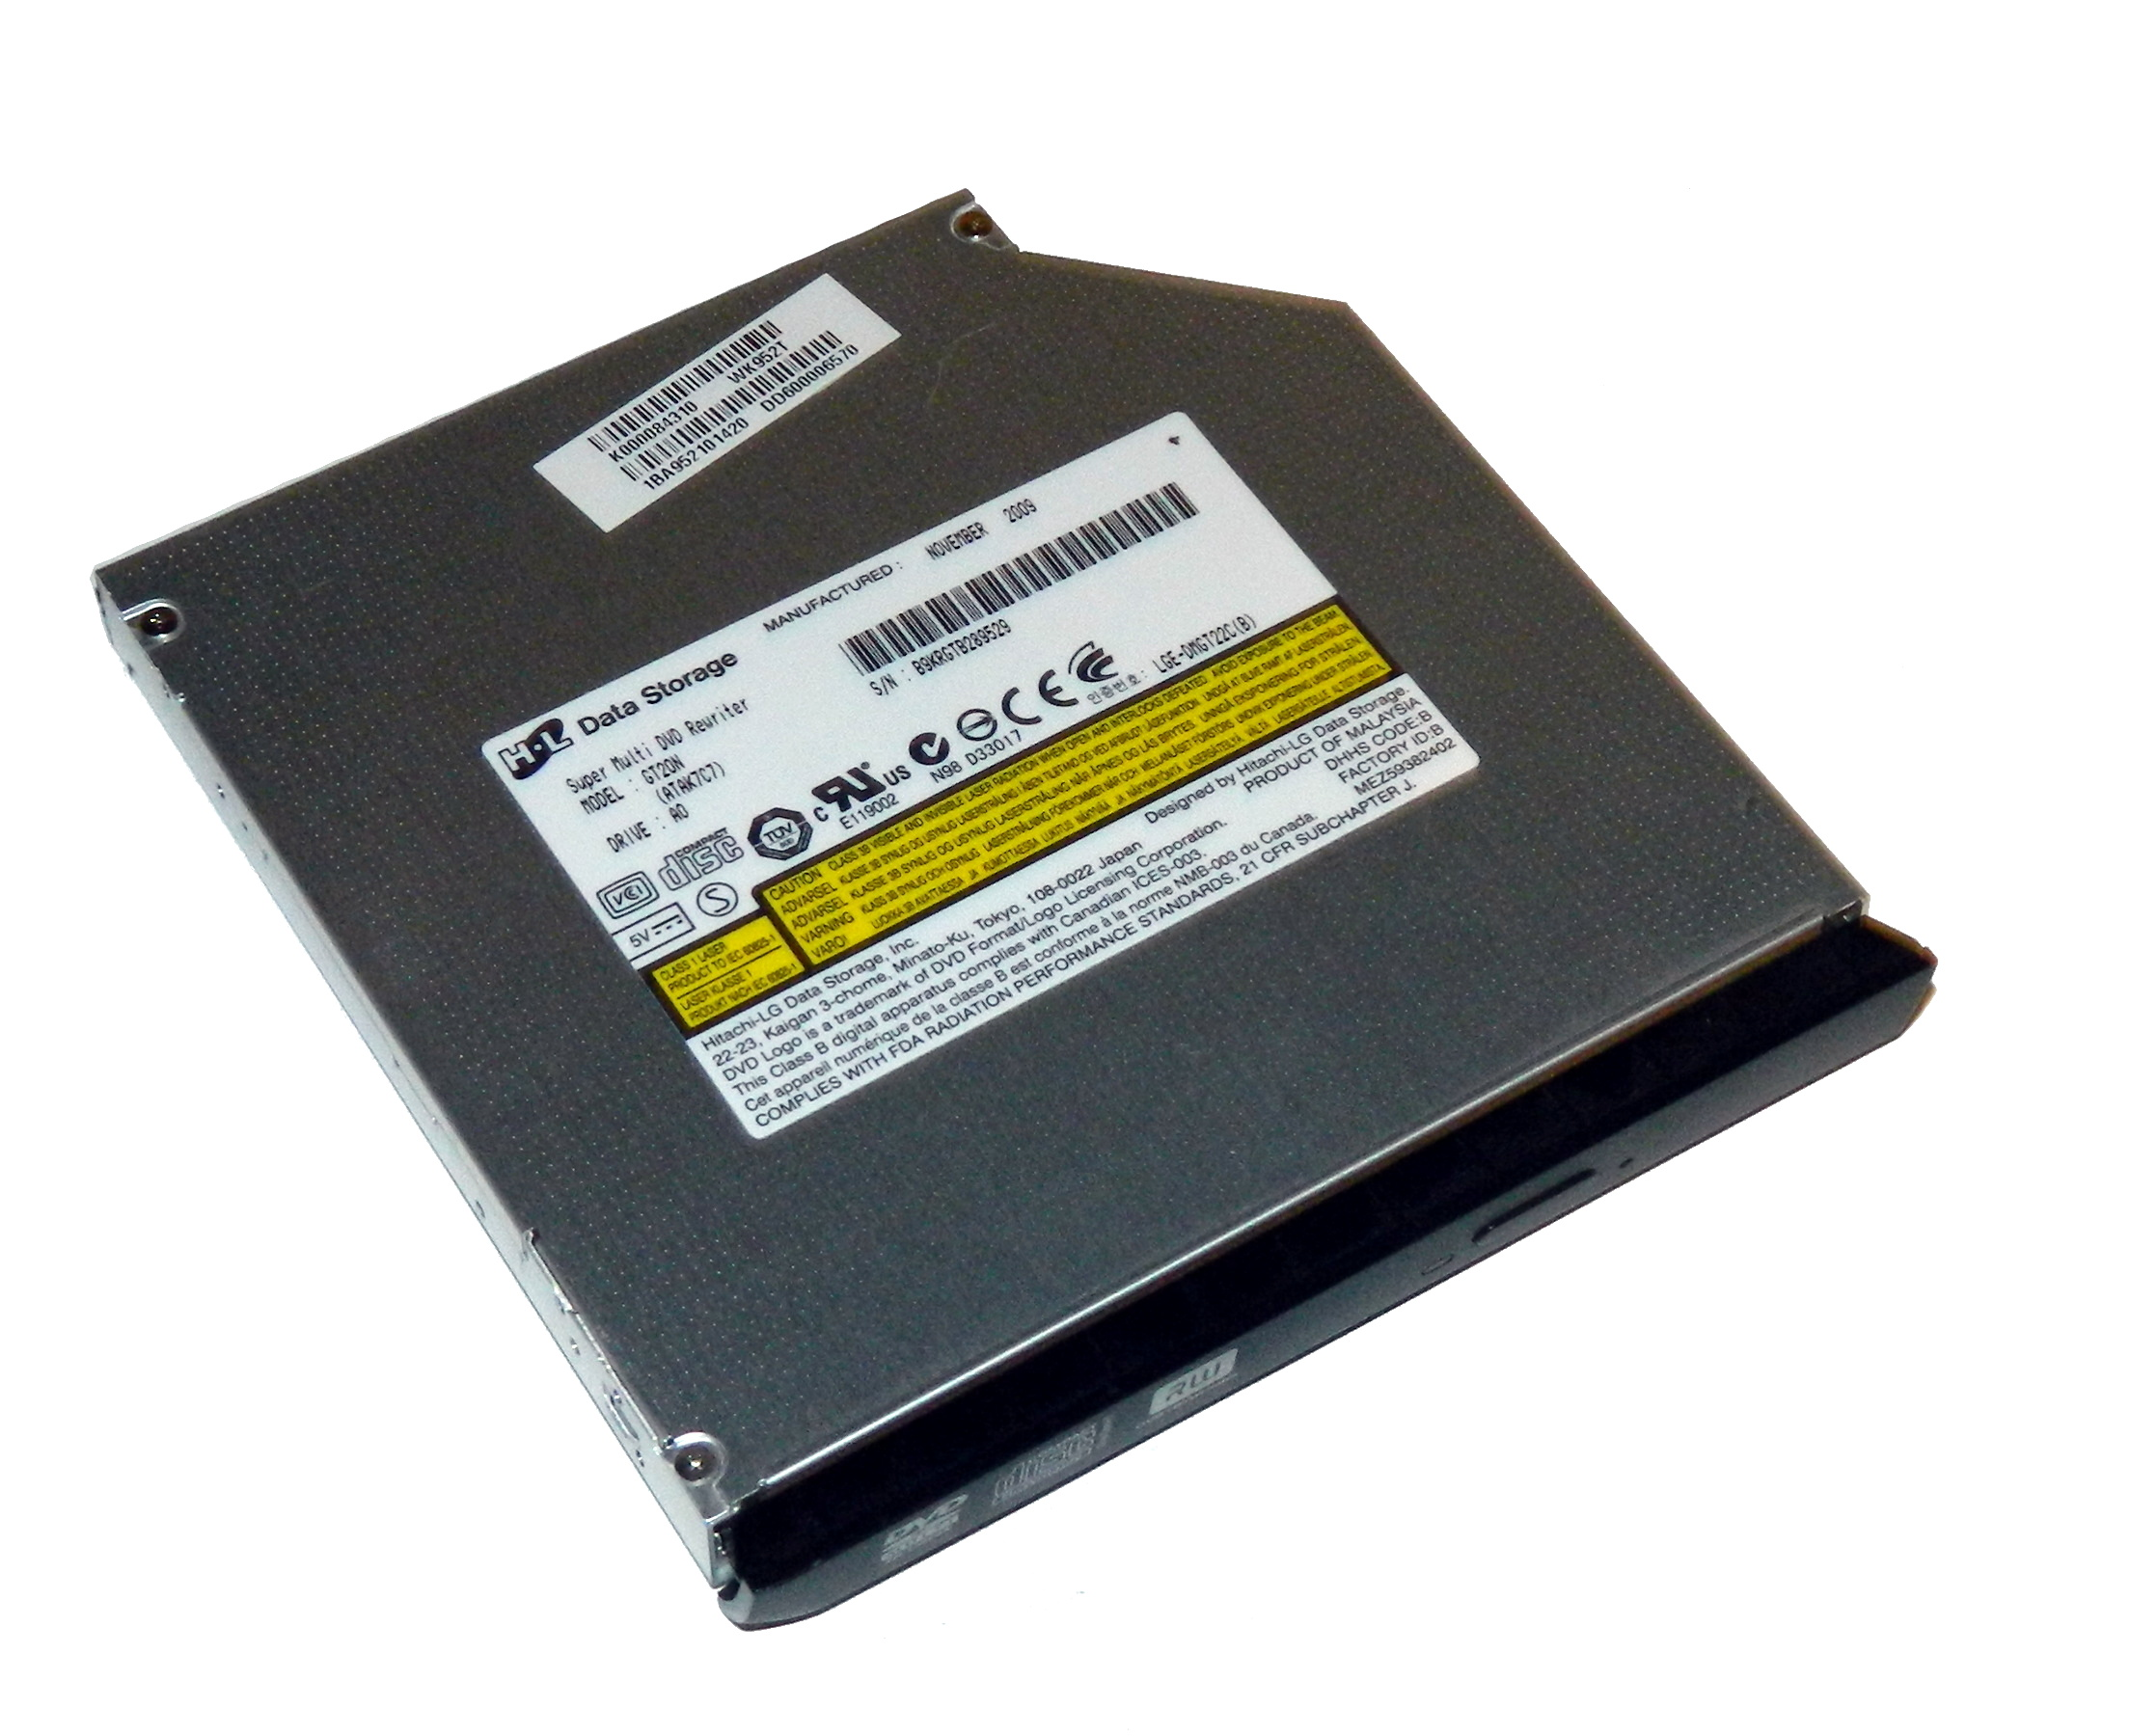 DVD GT20N WINDOWS 7 64BIT DRIVER